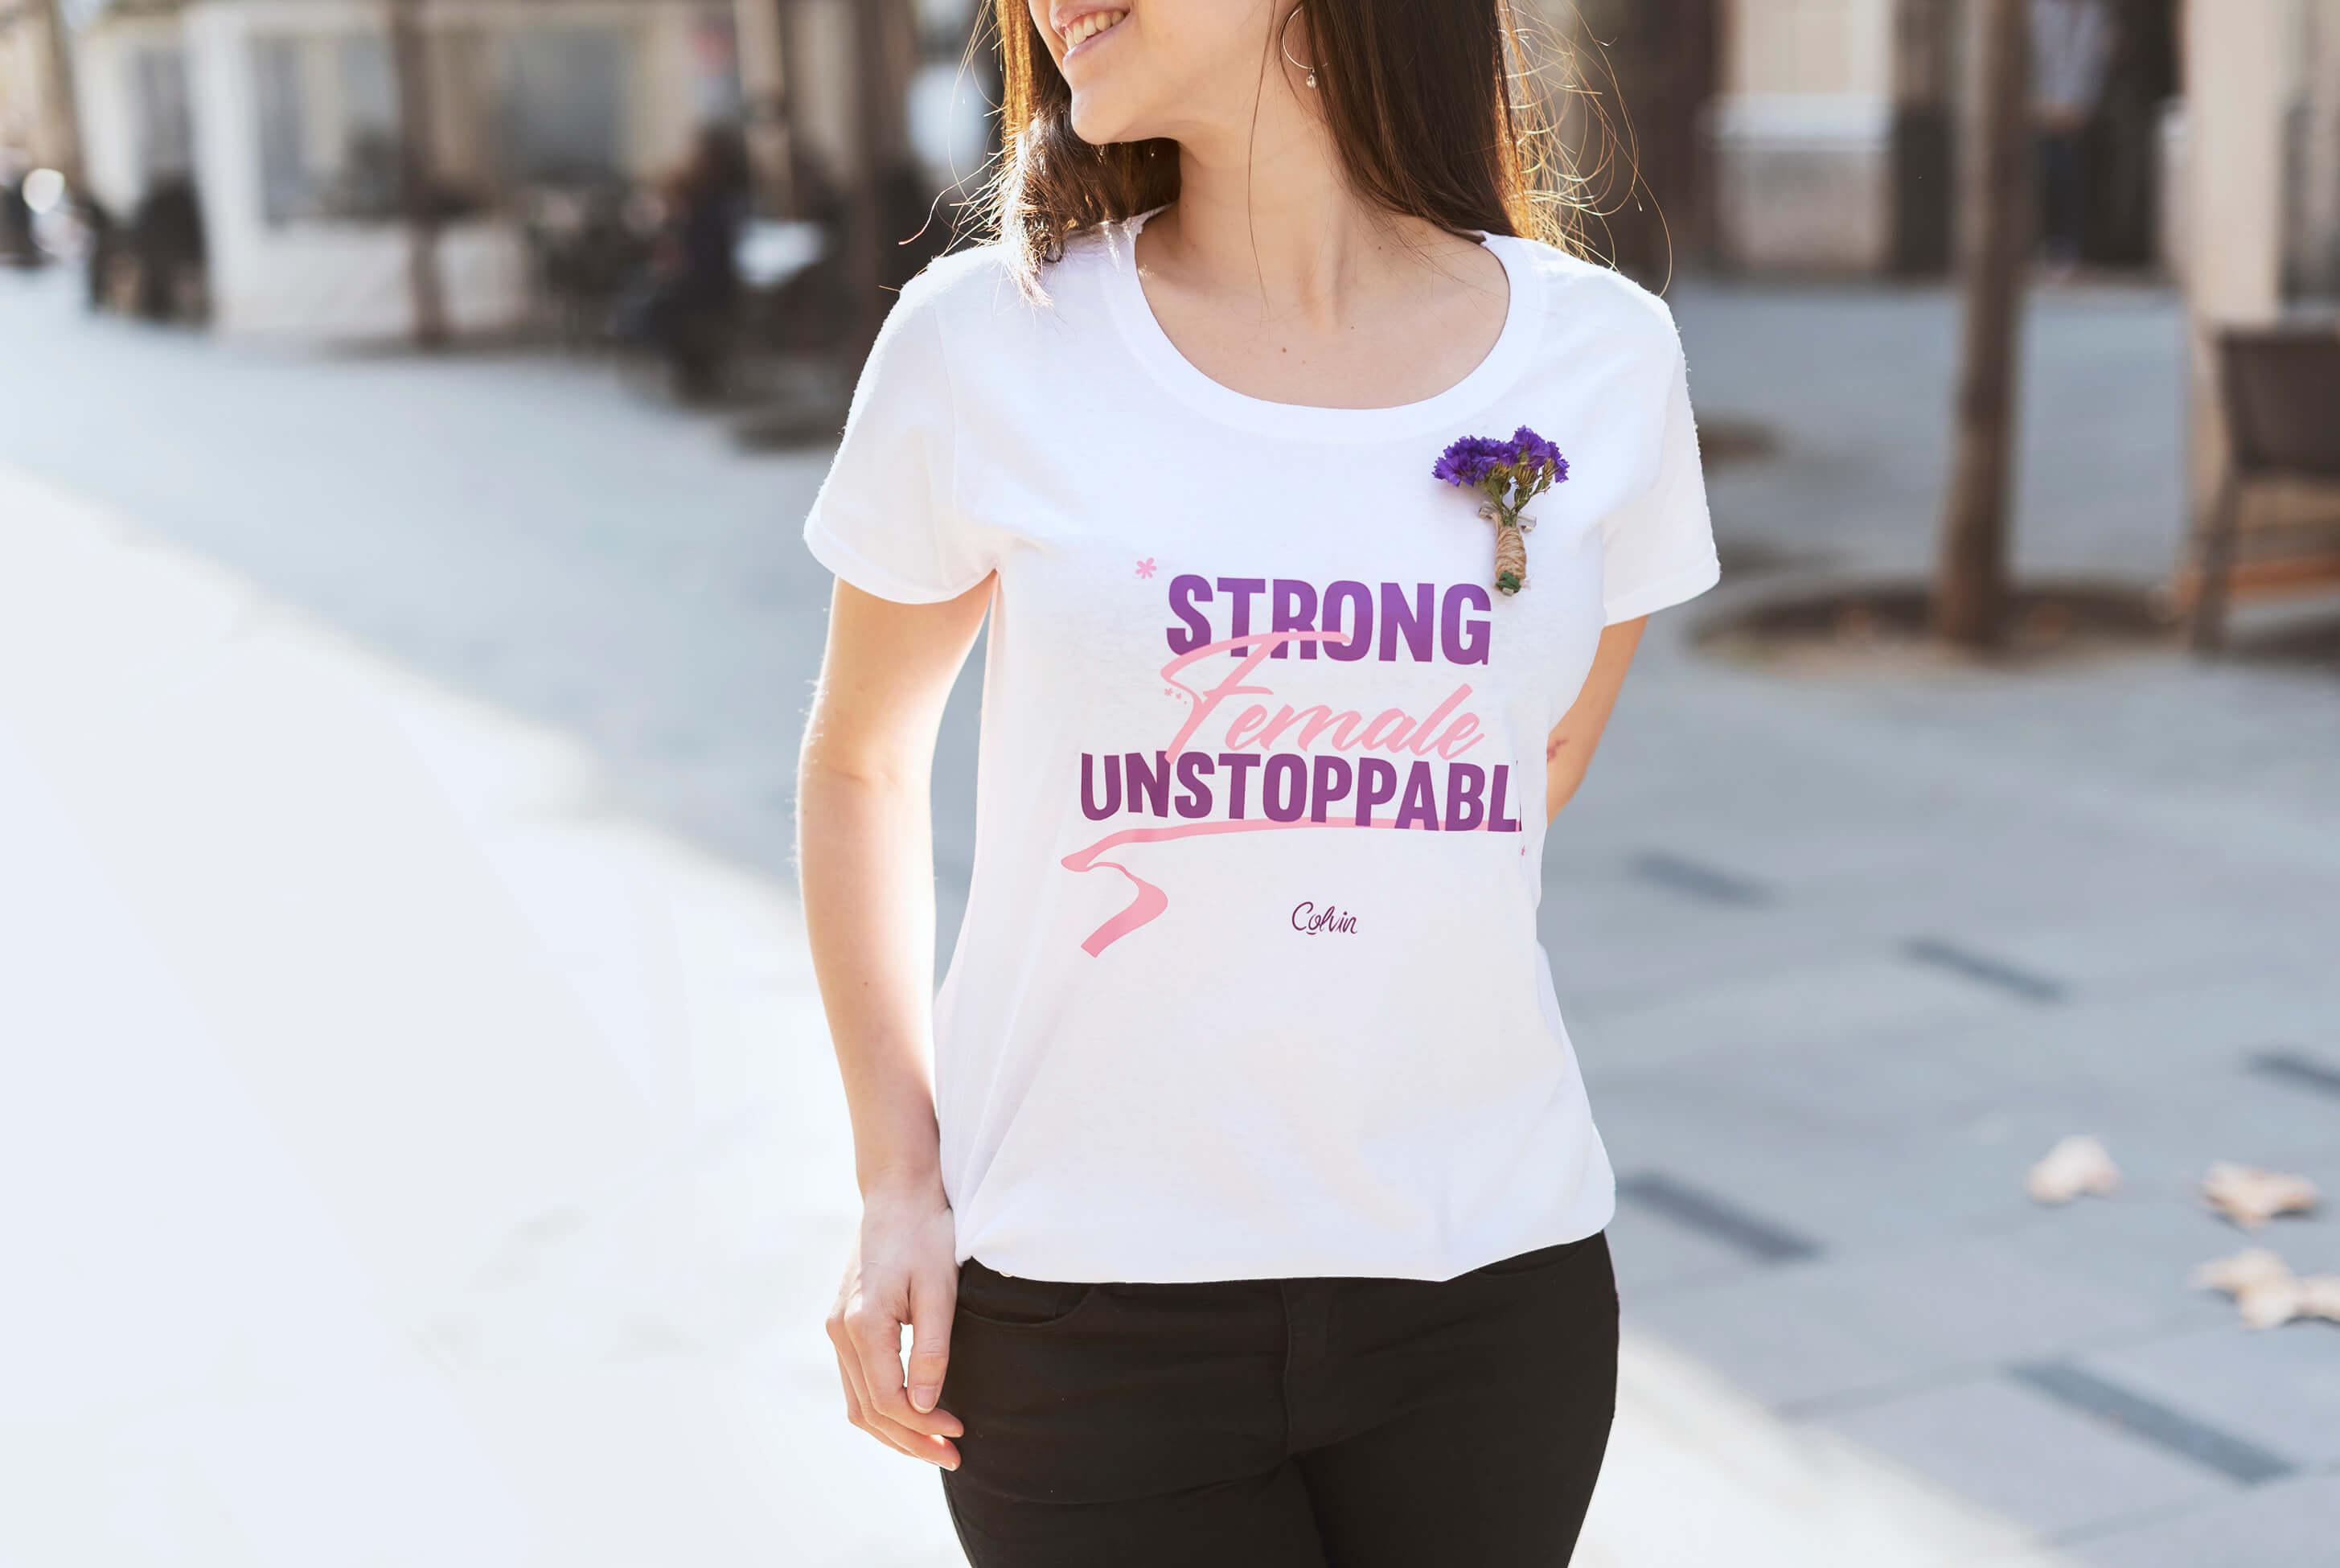 strong female unstoppable camiseta para el dia de la mujer